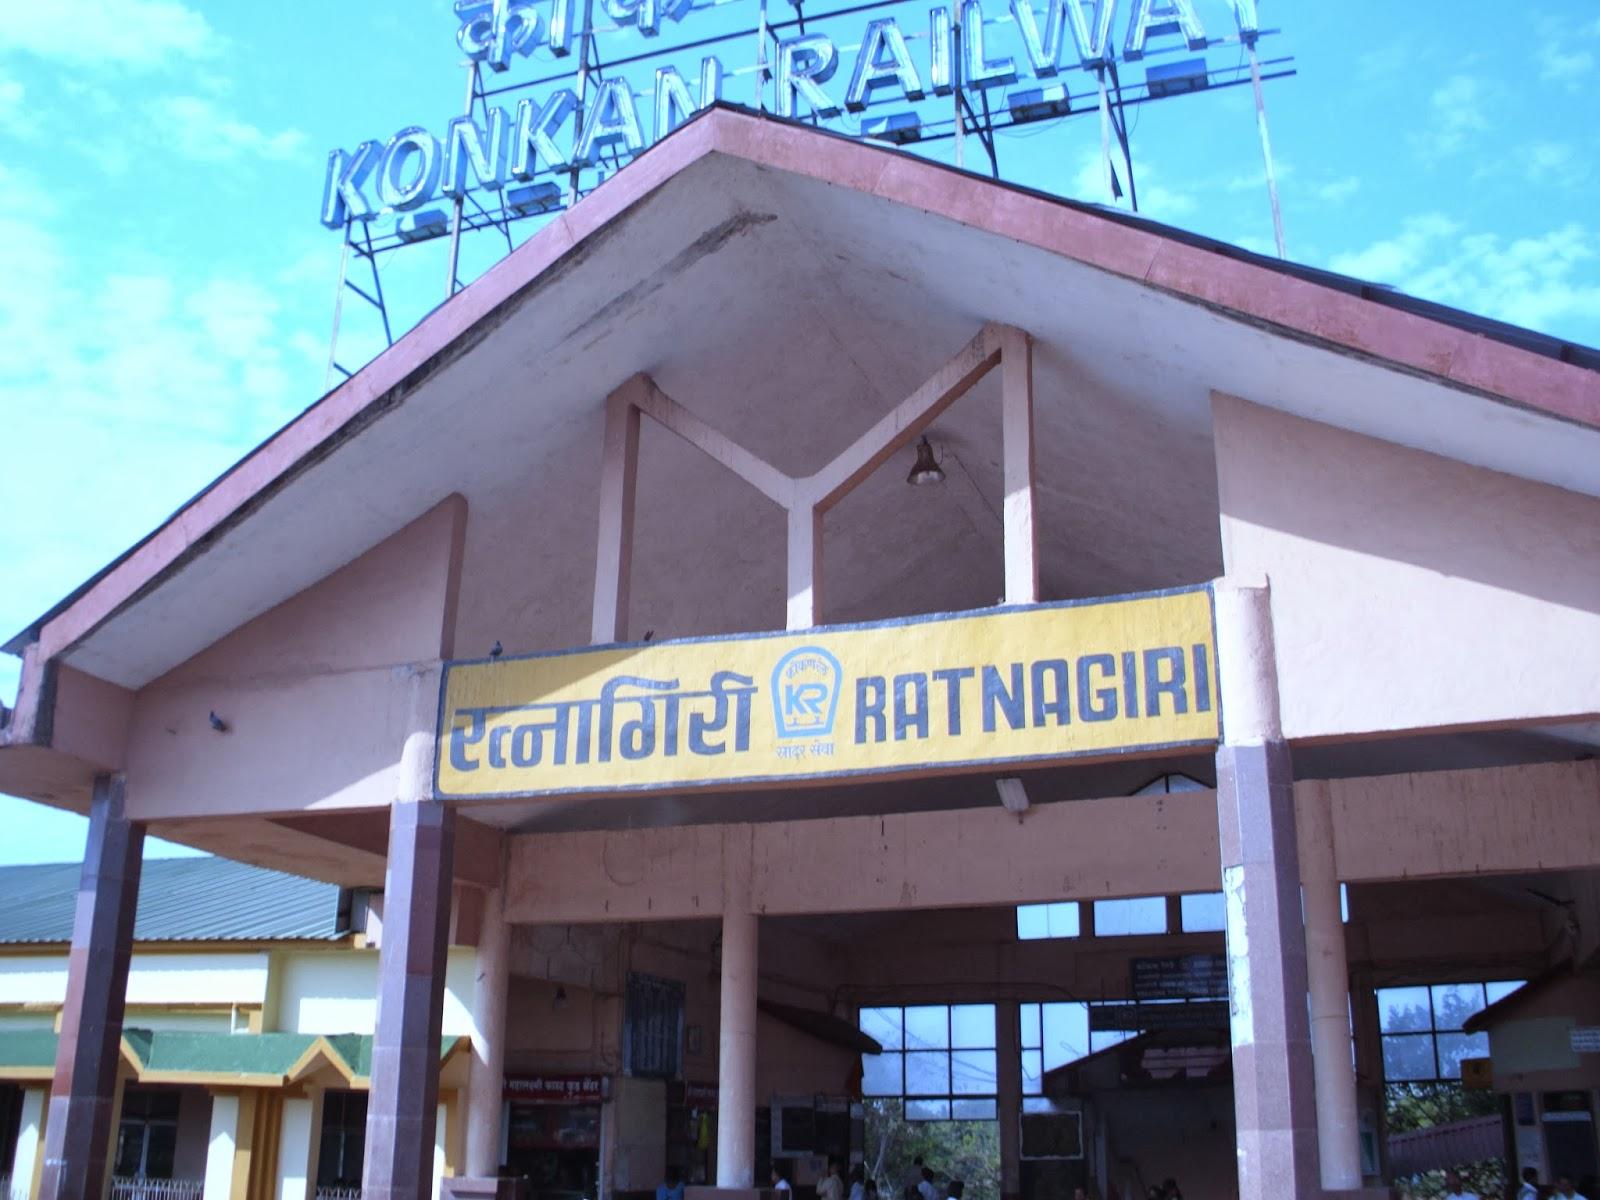 Ratnagiri Railway Station